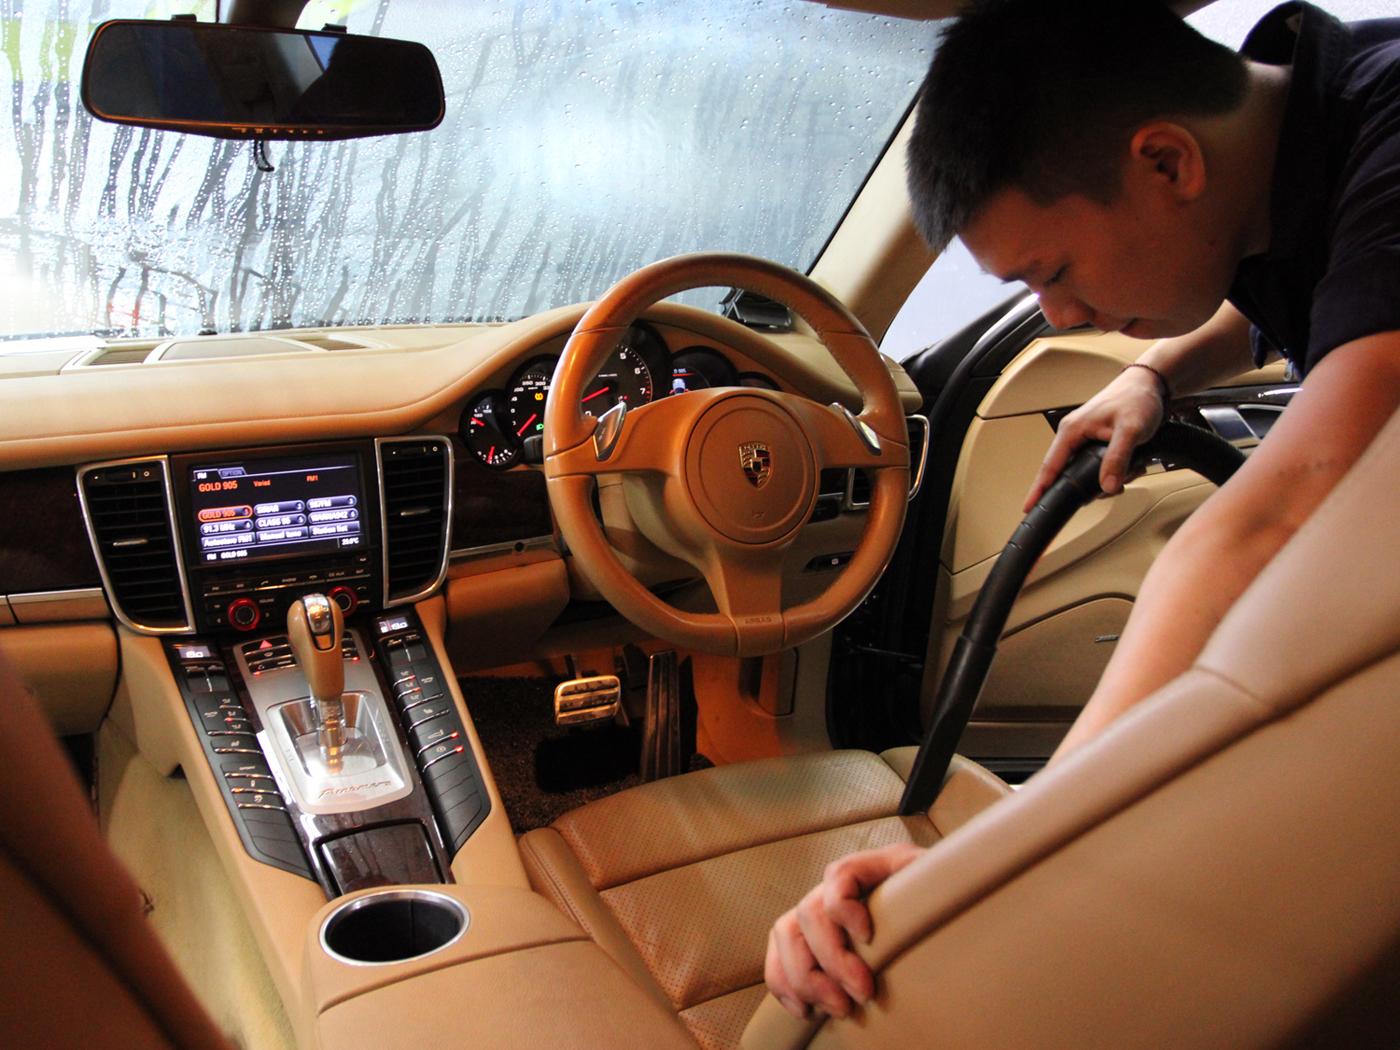 Saniswiss S1 Interior Sanitisation (With Car Wash & Vacuum)